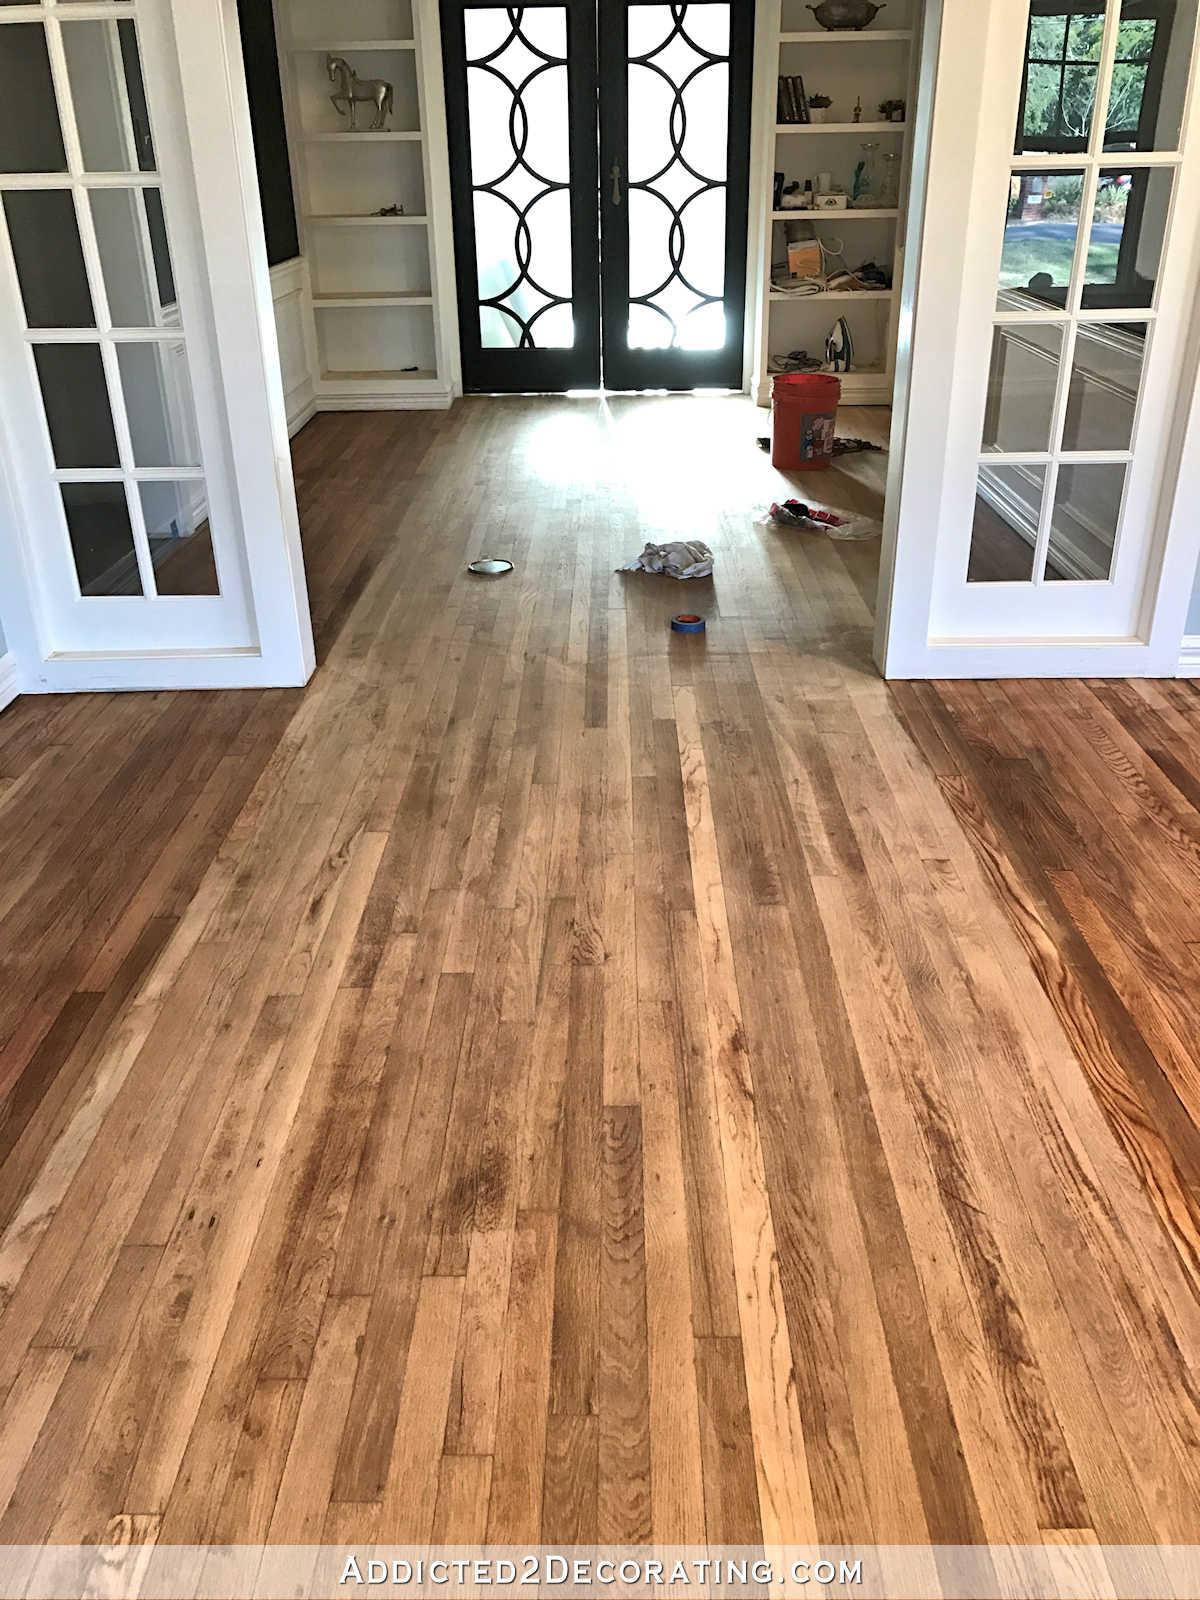 hardwood flooring reno depot of adventures in staining my red oak hardwood floors products process throughout staining red oak hardwood floors 5 music room wood conditioner